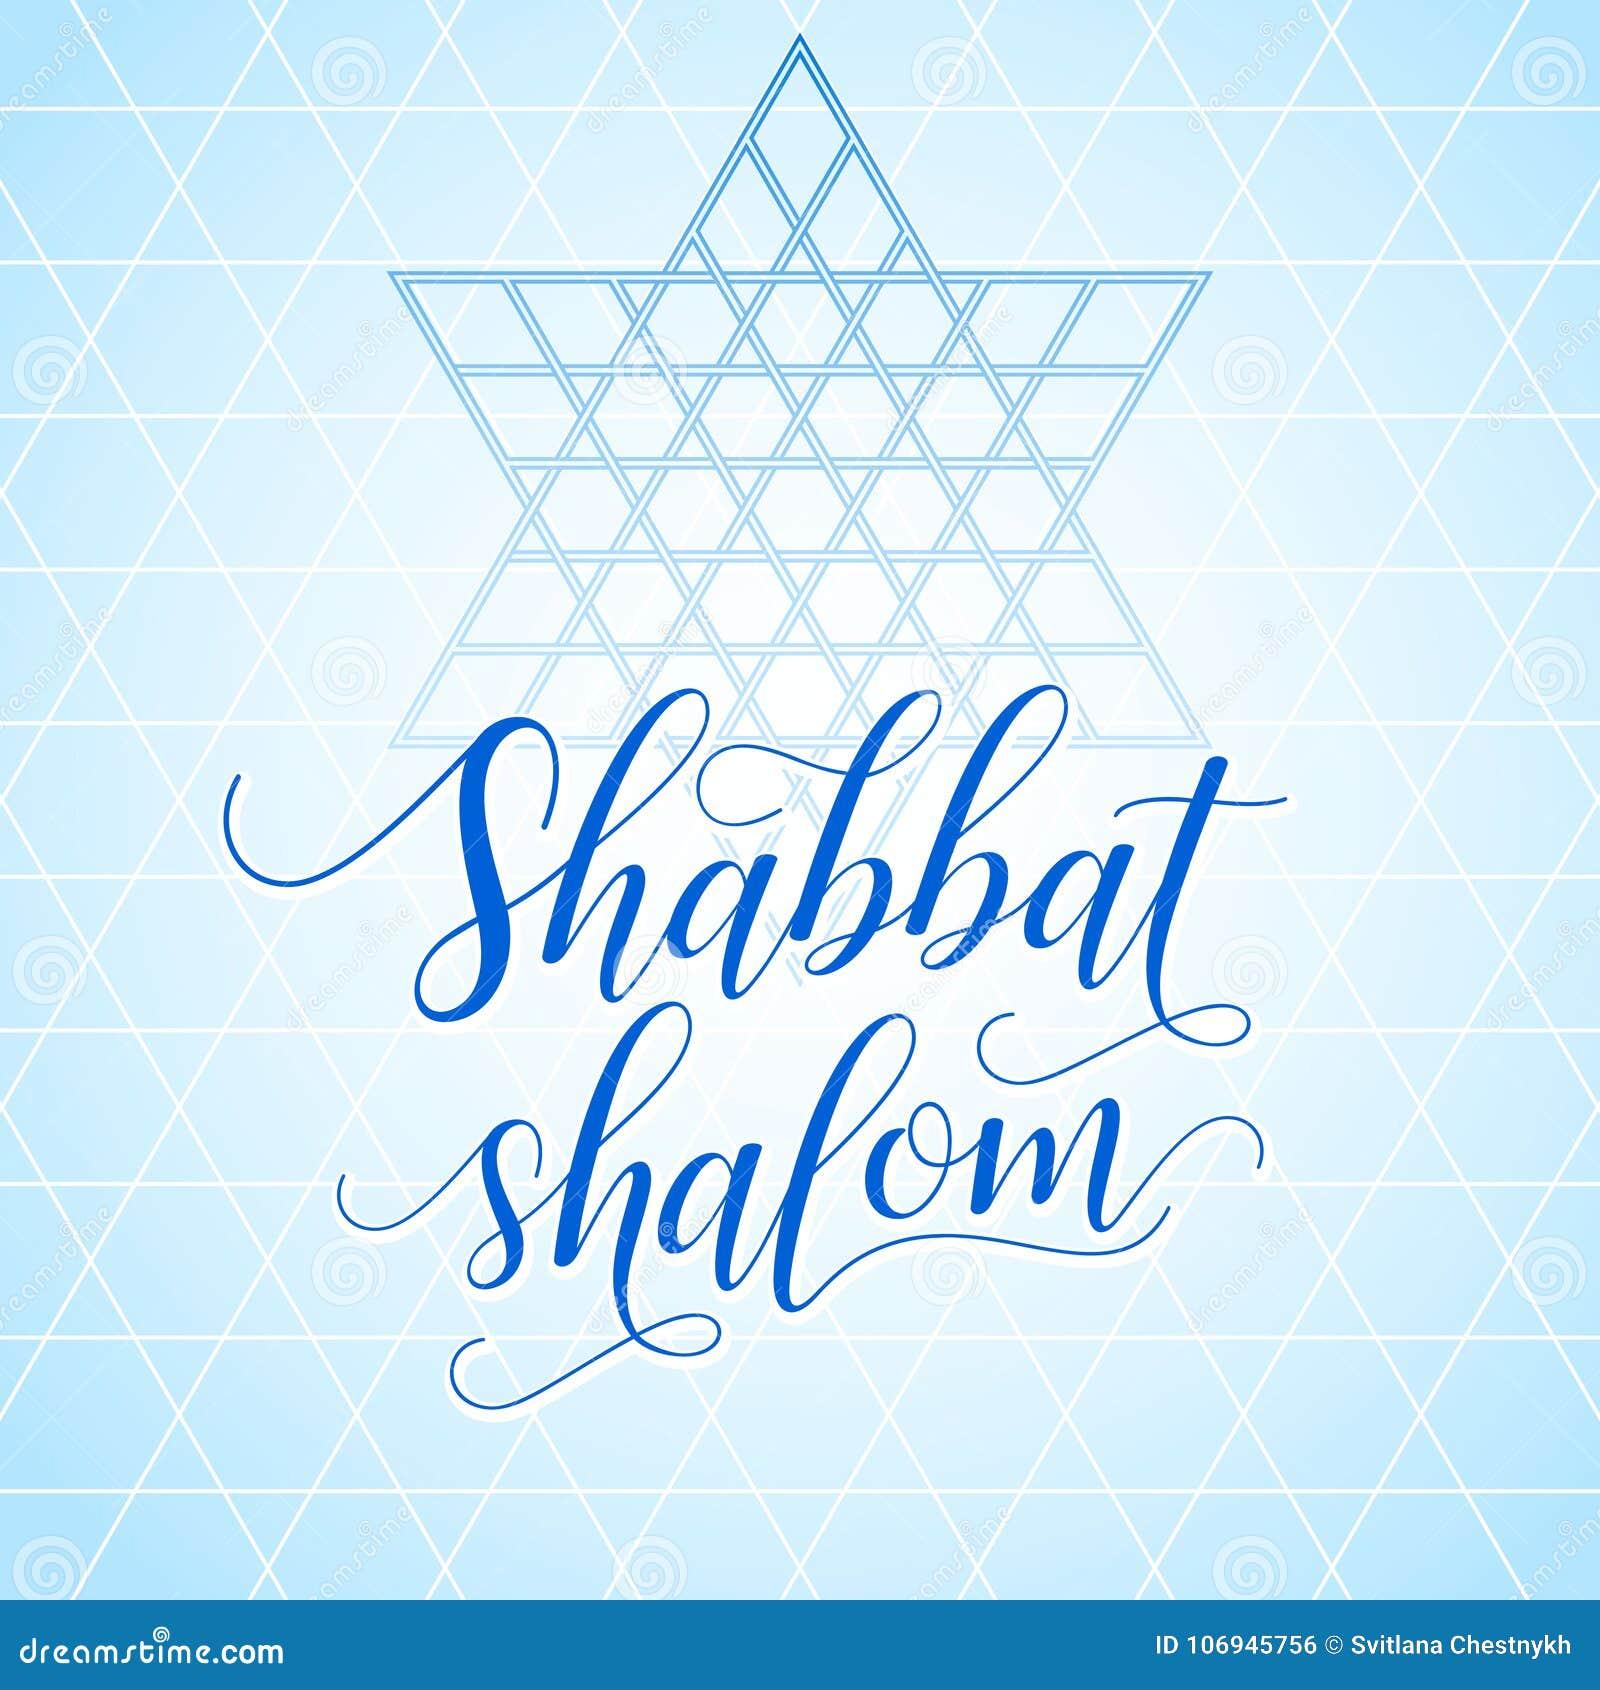 Shabbat shalom greeting card mosaic light blue background stock colorful shabbat shalom greeting card vector illustration jewish religious sabbath congratulations hebrew abstract geometric 106945756g m4hsunfo